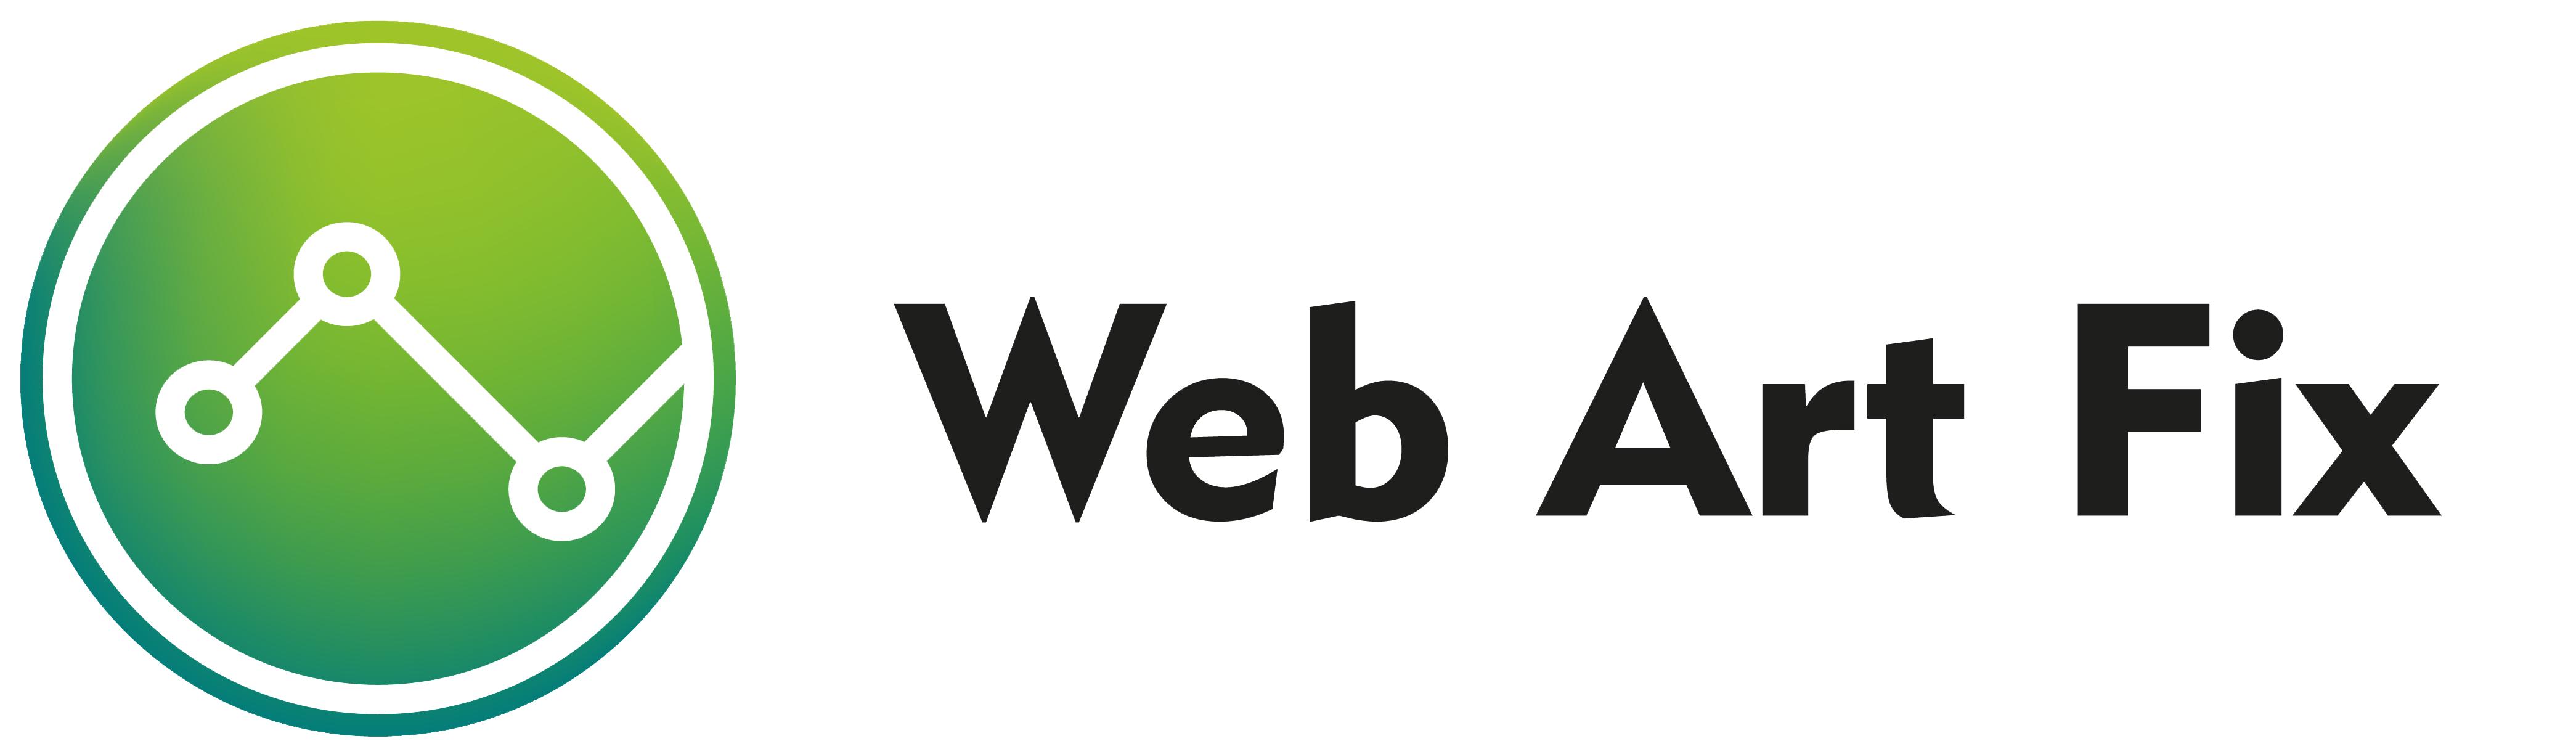 WebArtFix